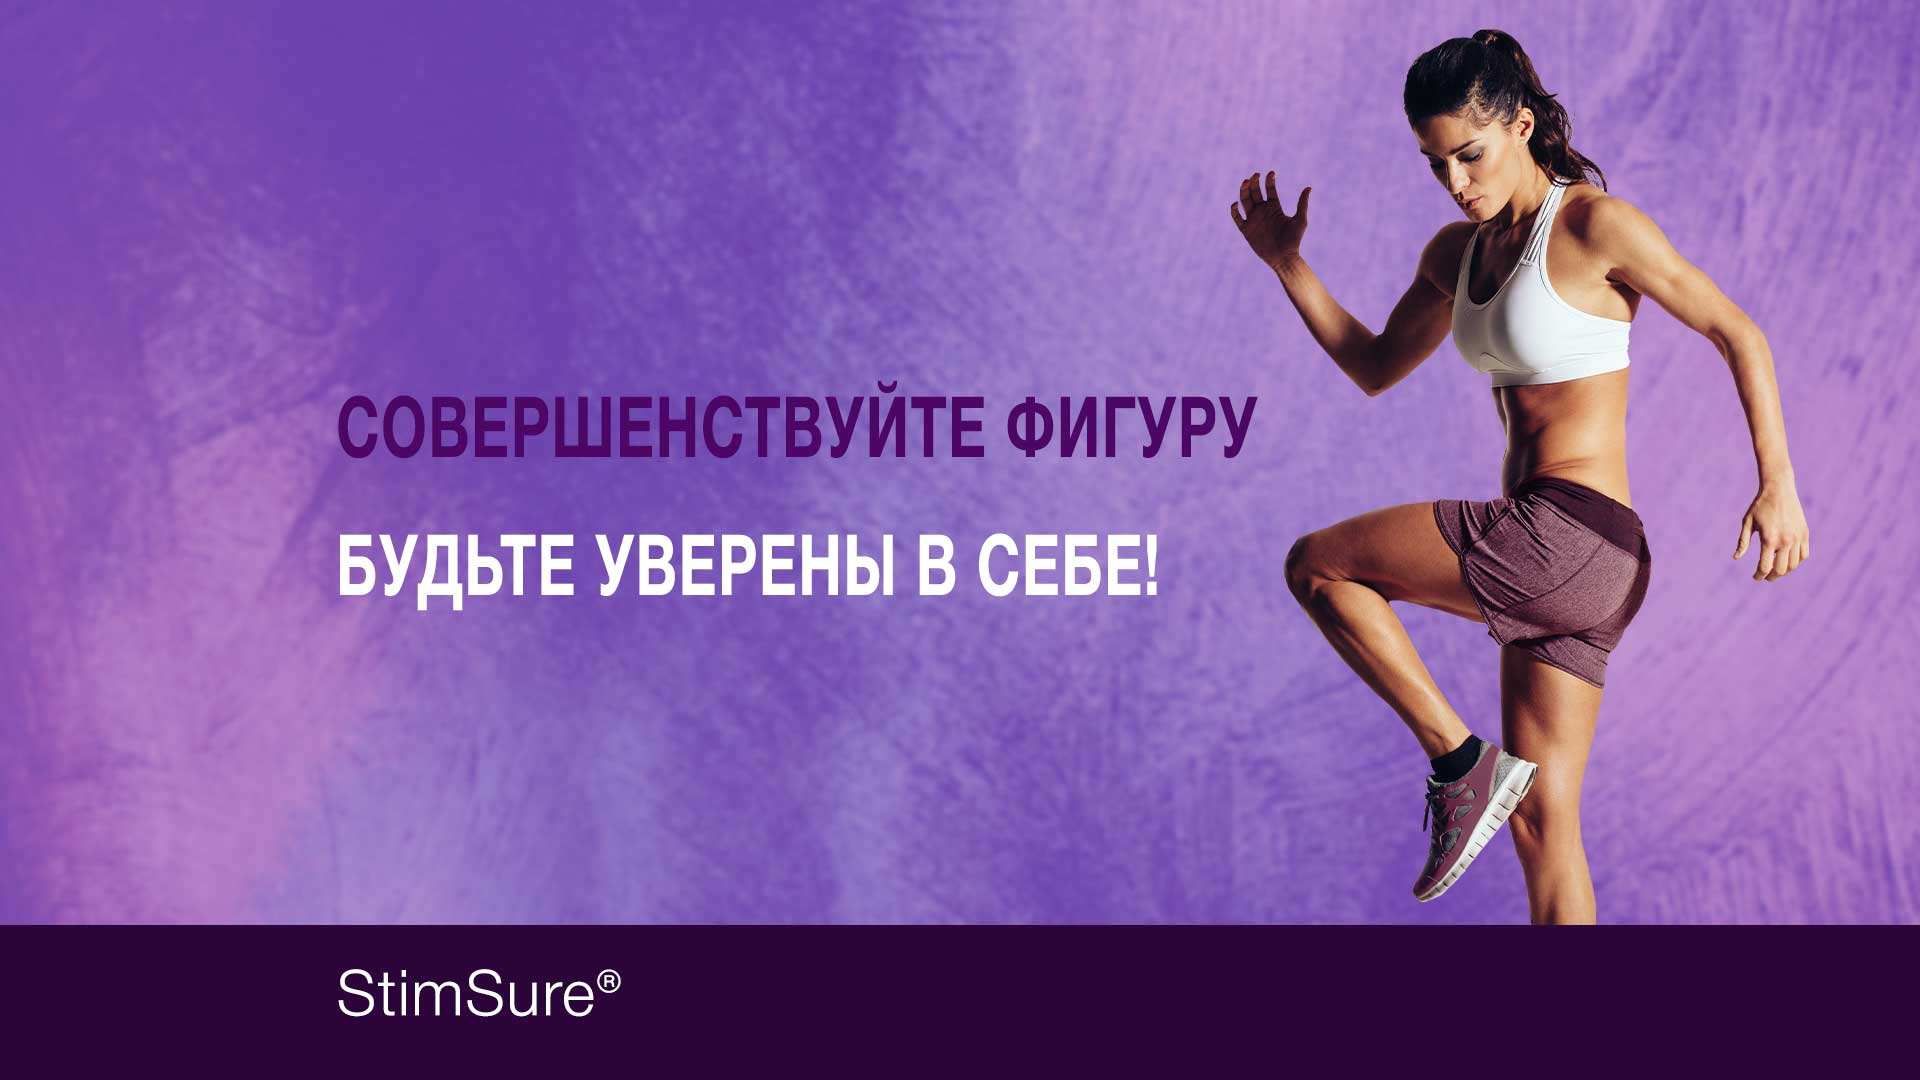 StimSure электромагнитная стимуляция мышц